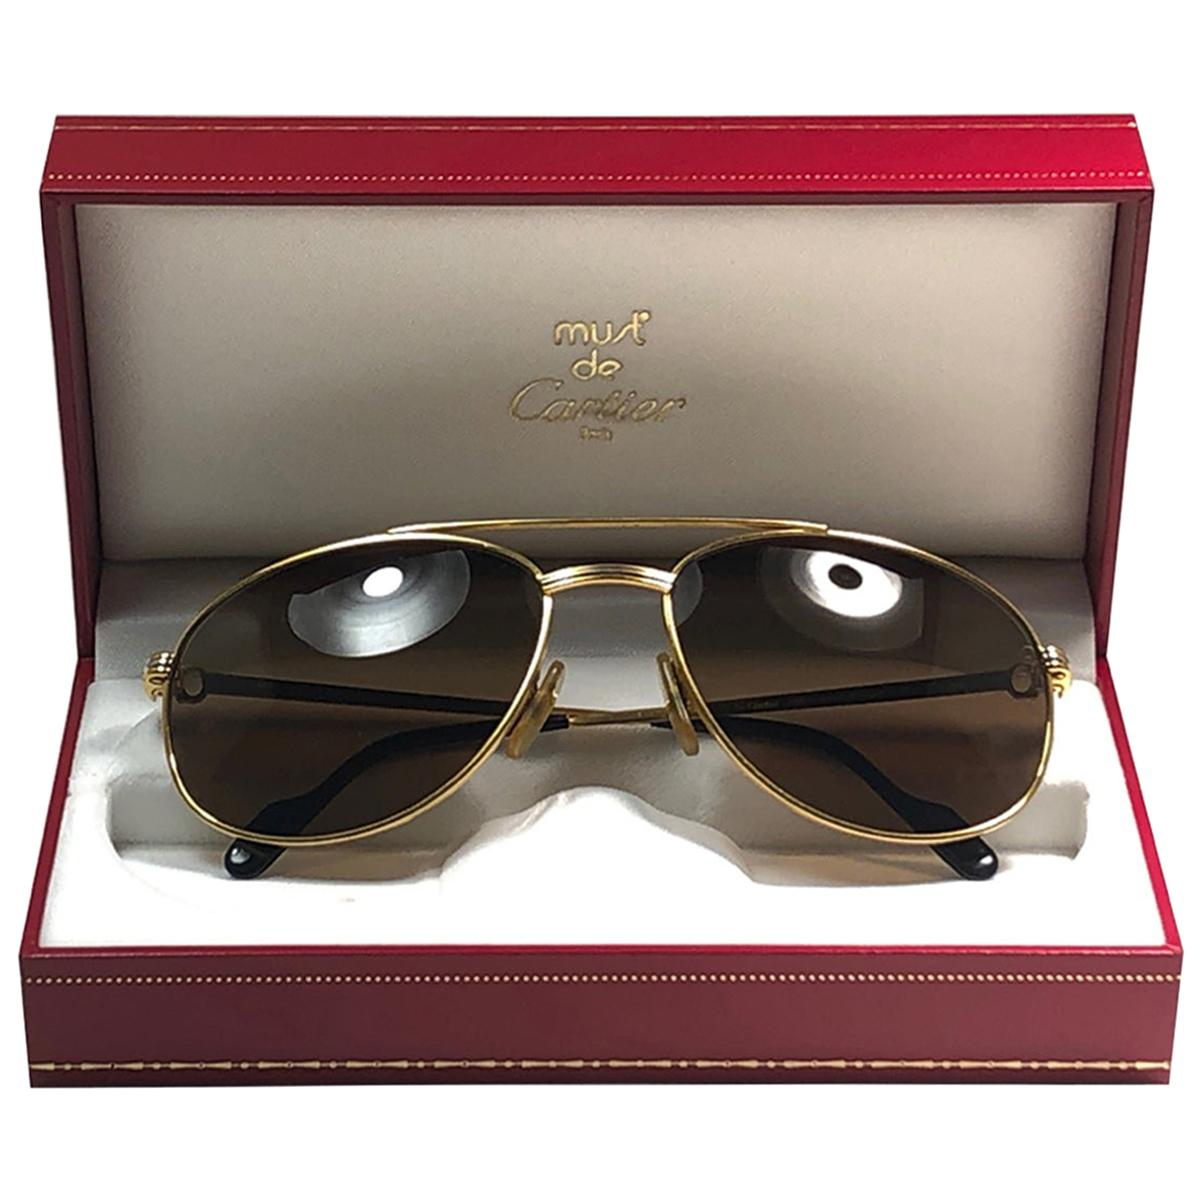 Vintage Cartier Driver Gold Plated 60 Frame France 1990 Sunglasses